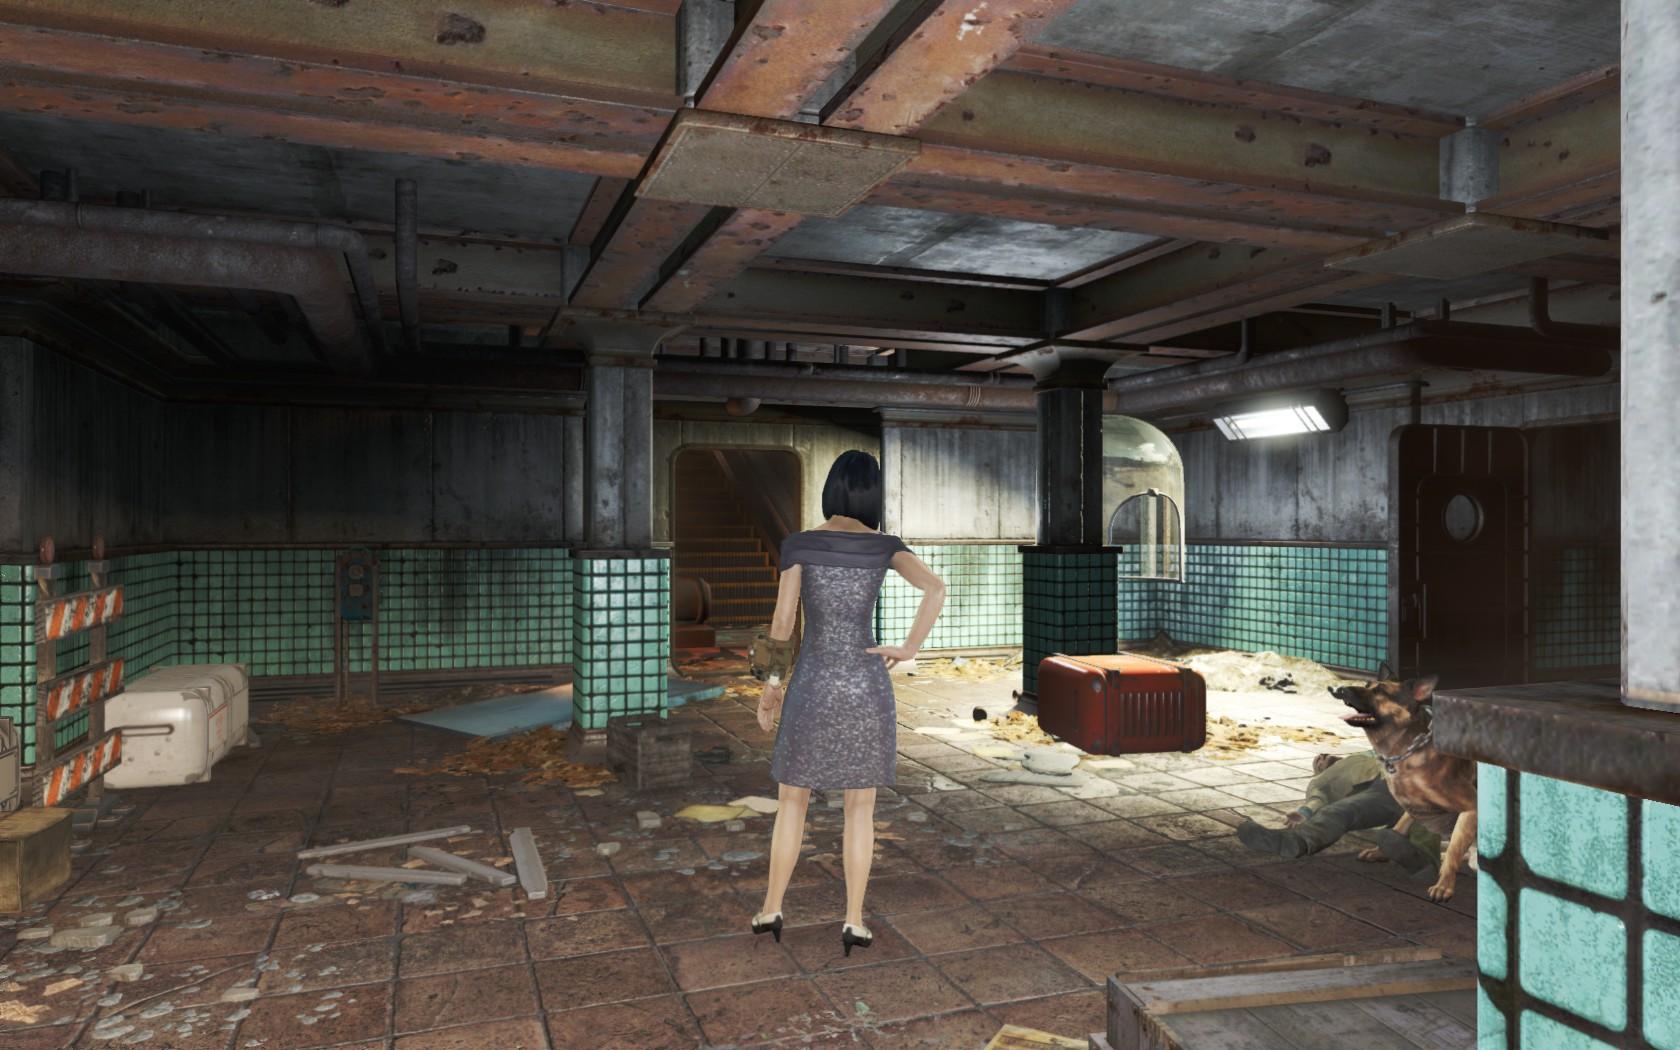 20170819185826_1.jpg - Fallout 4